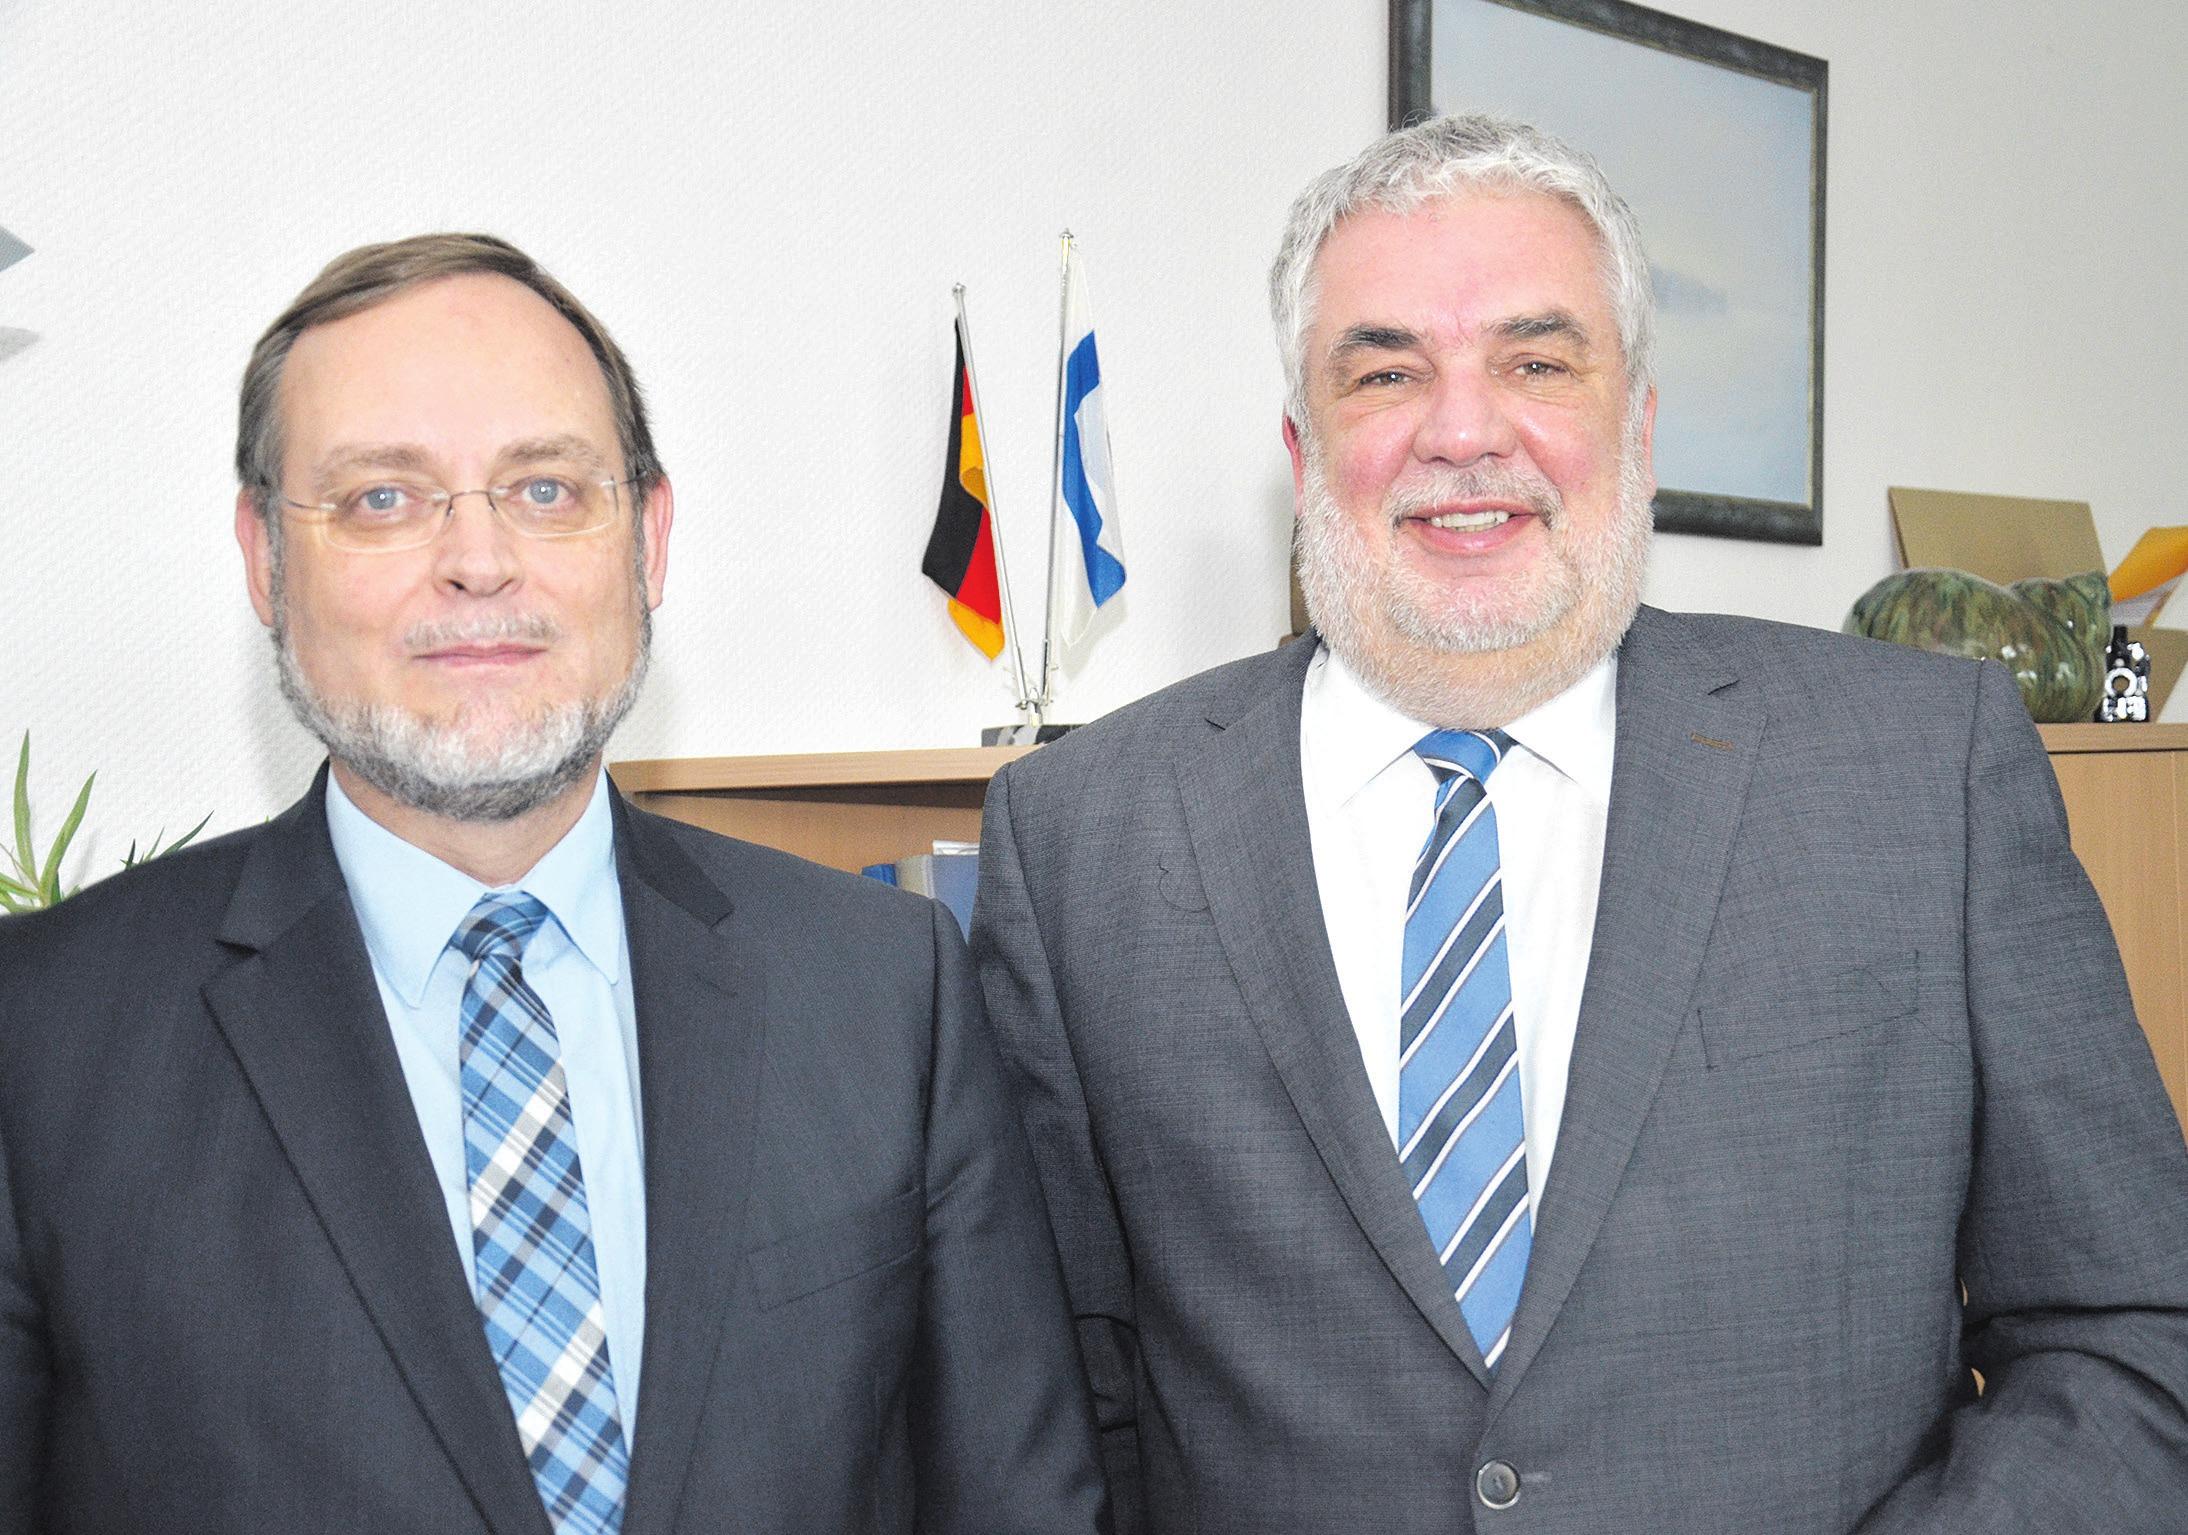 Erster Kreisrat Michael Cordioli (links) und Landrat Klaus Wiswe (rechts).